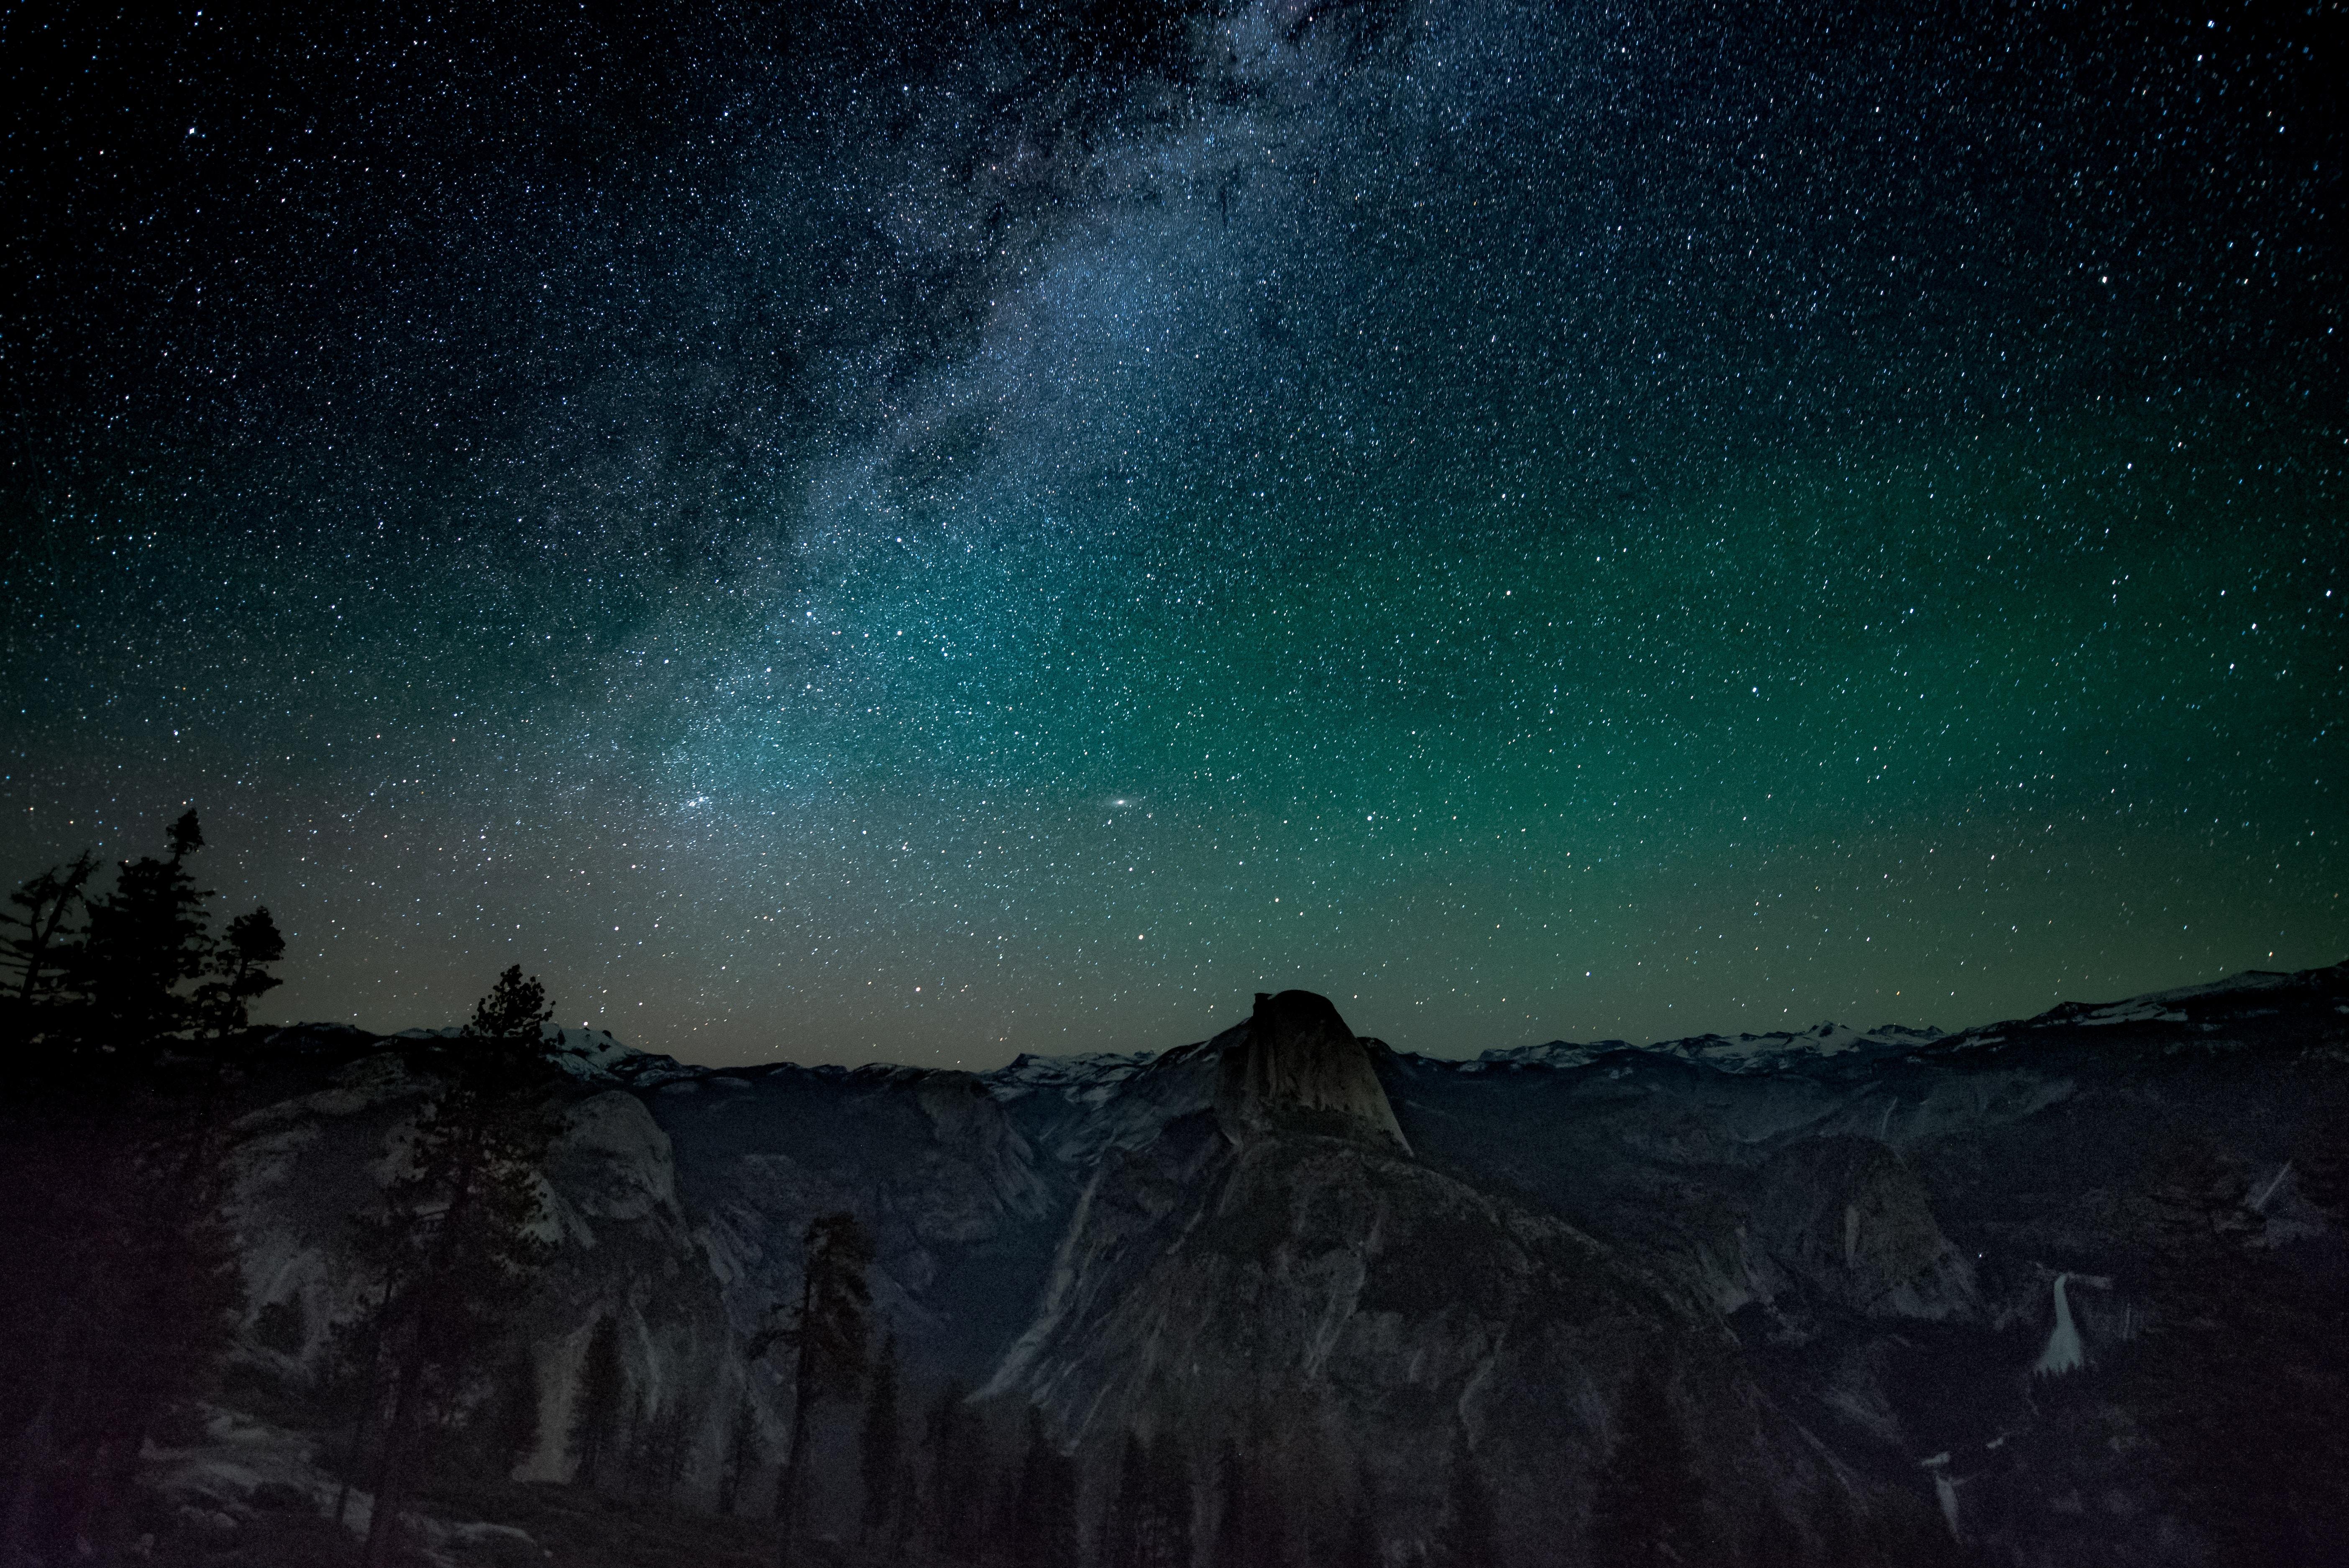 Wallpaper Weekends: Night Sky Over Yosemite for Mac, iPad ...